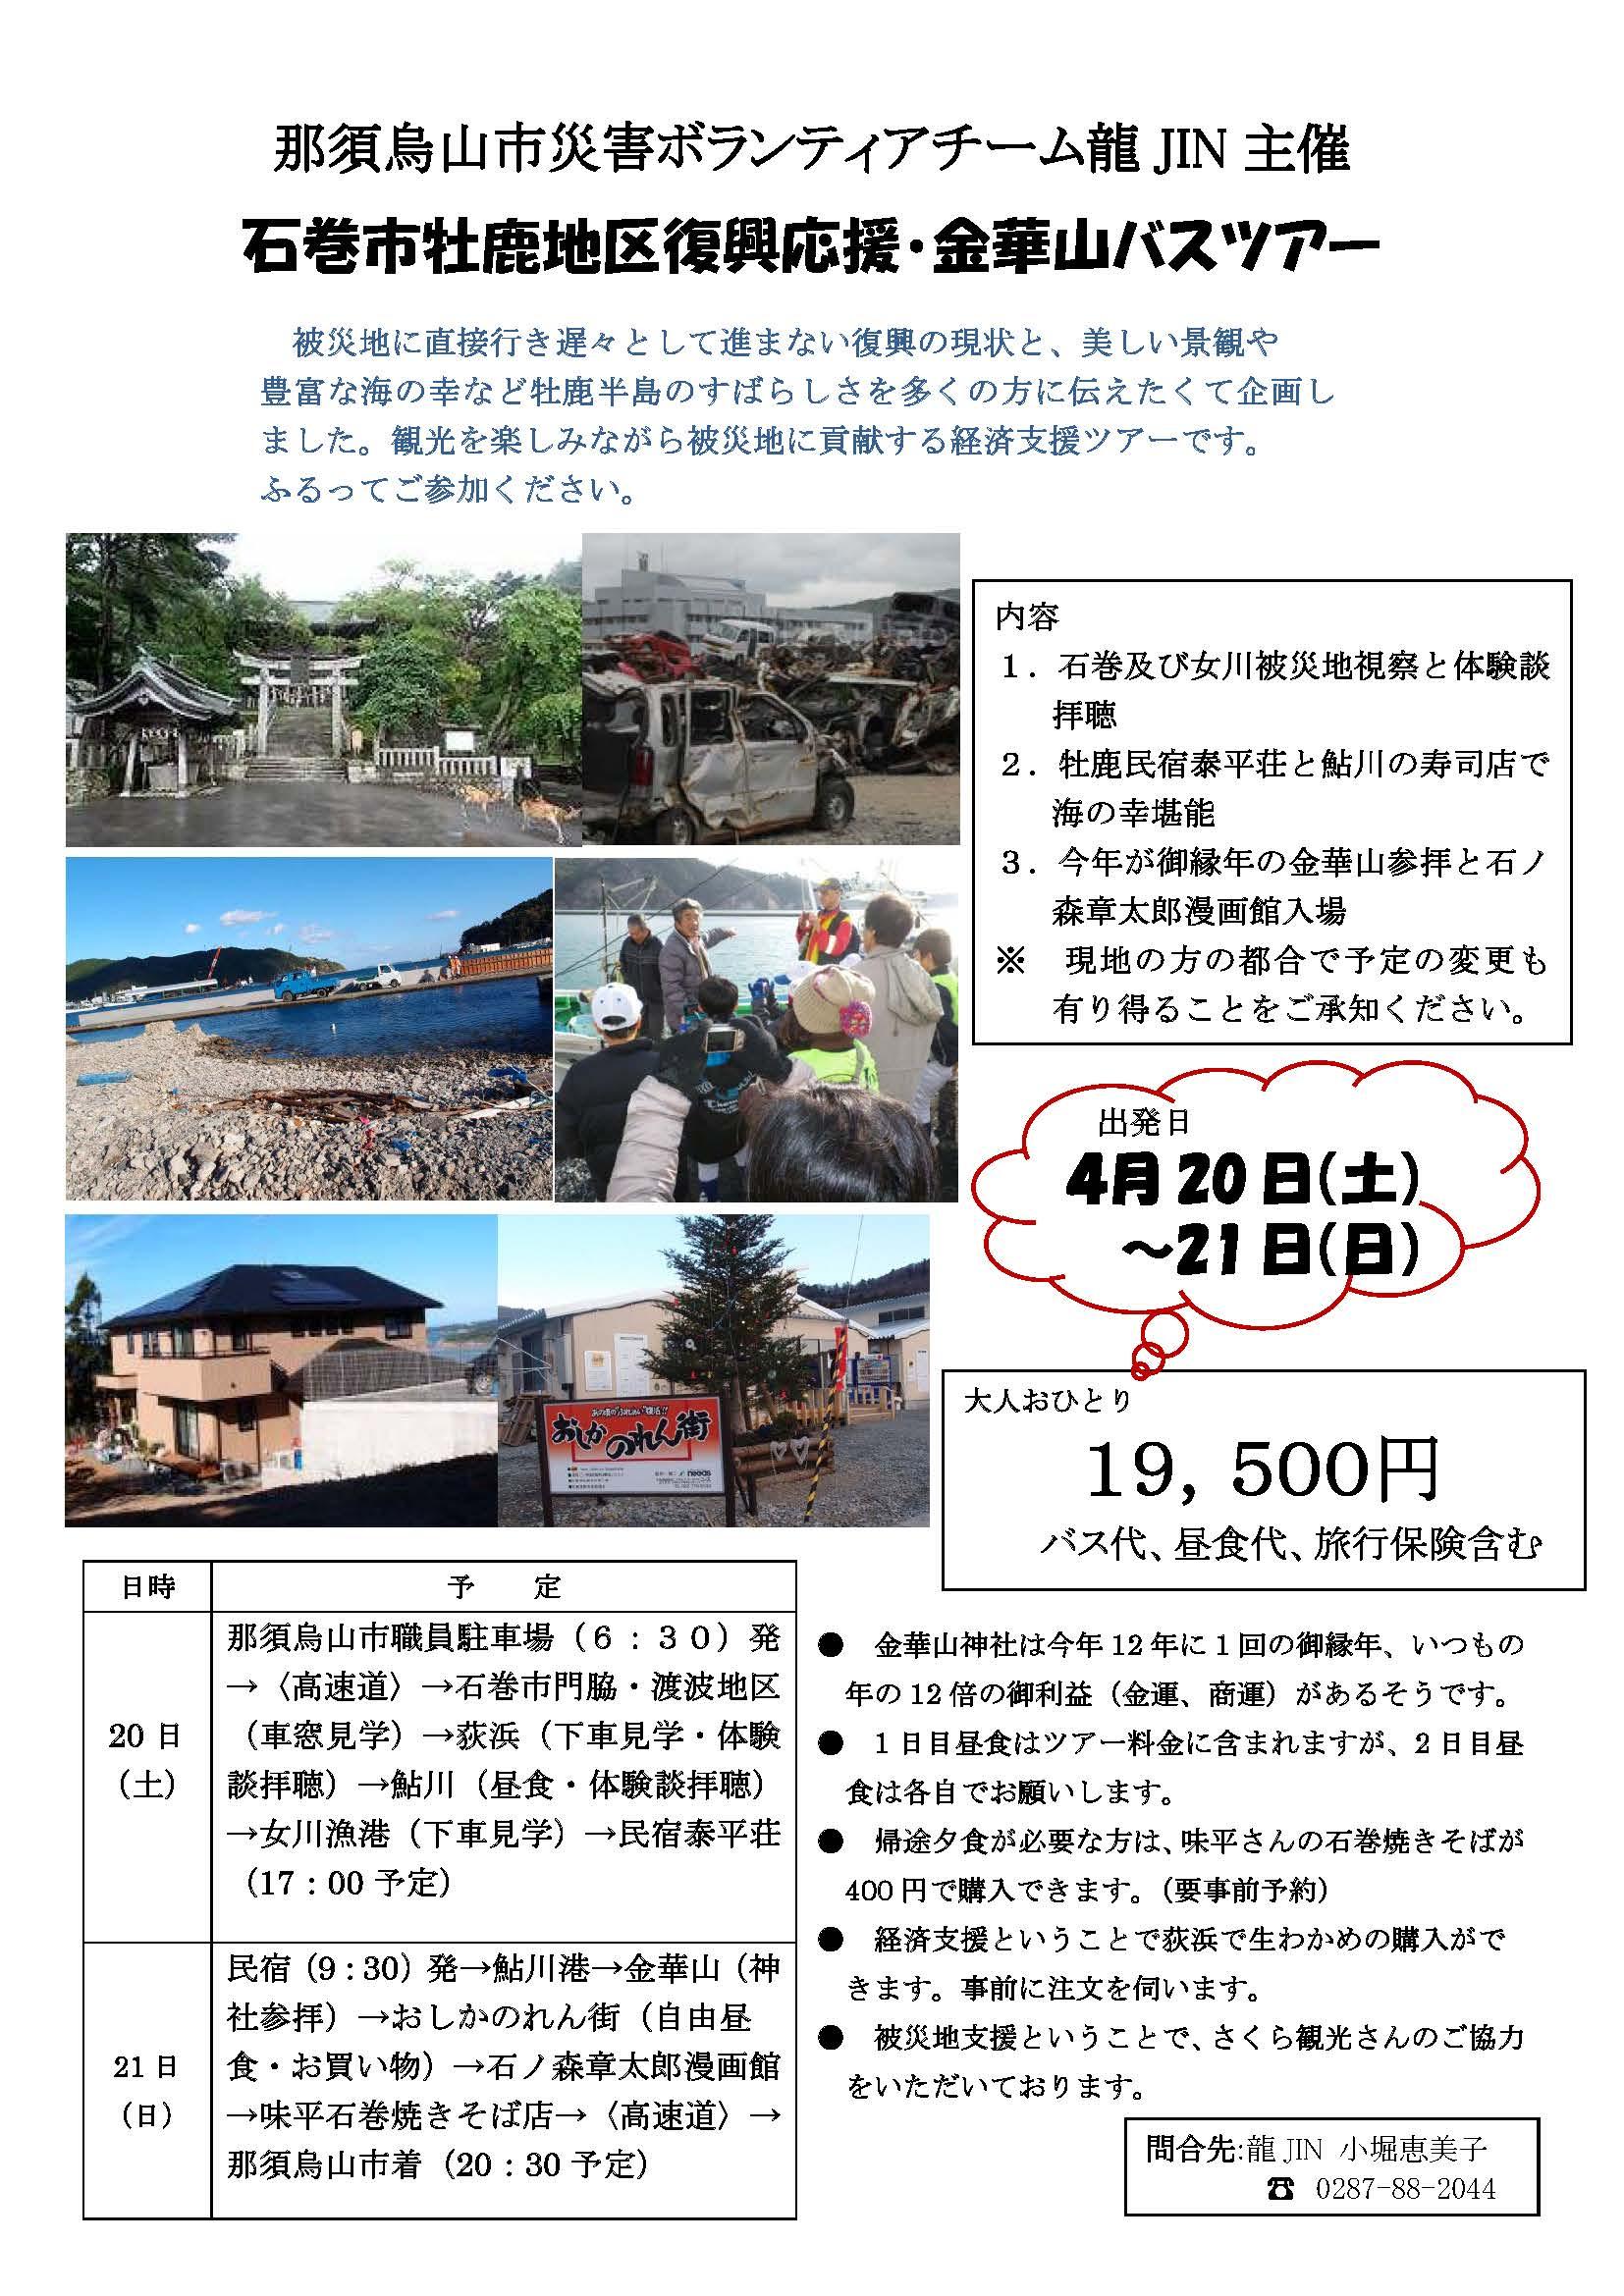 http://www.nasukarasuyama.org/blog/ryujintour130420.jpg